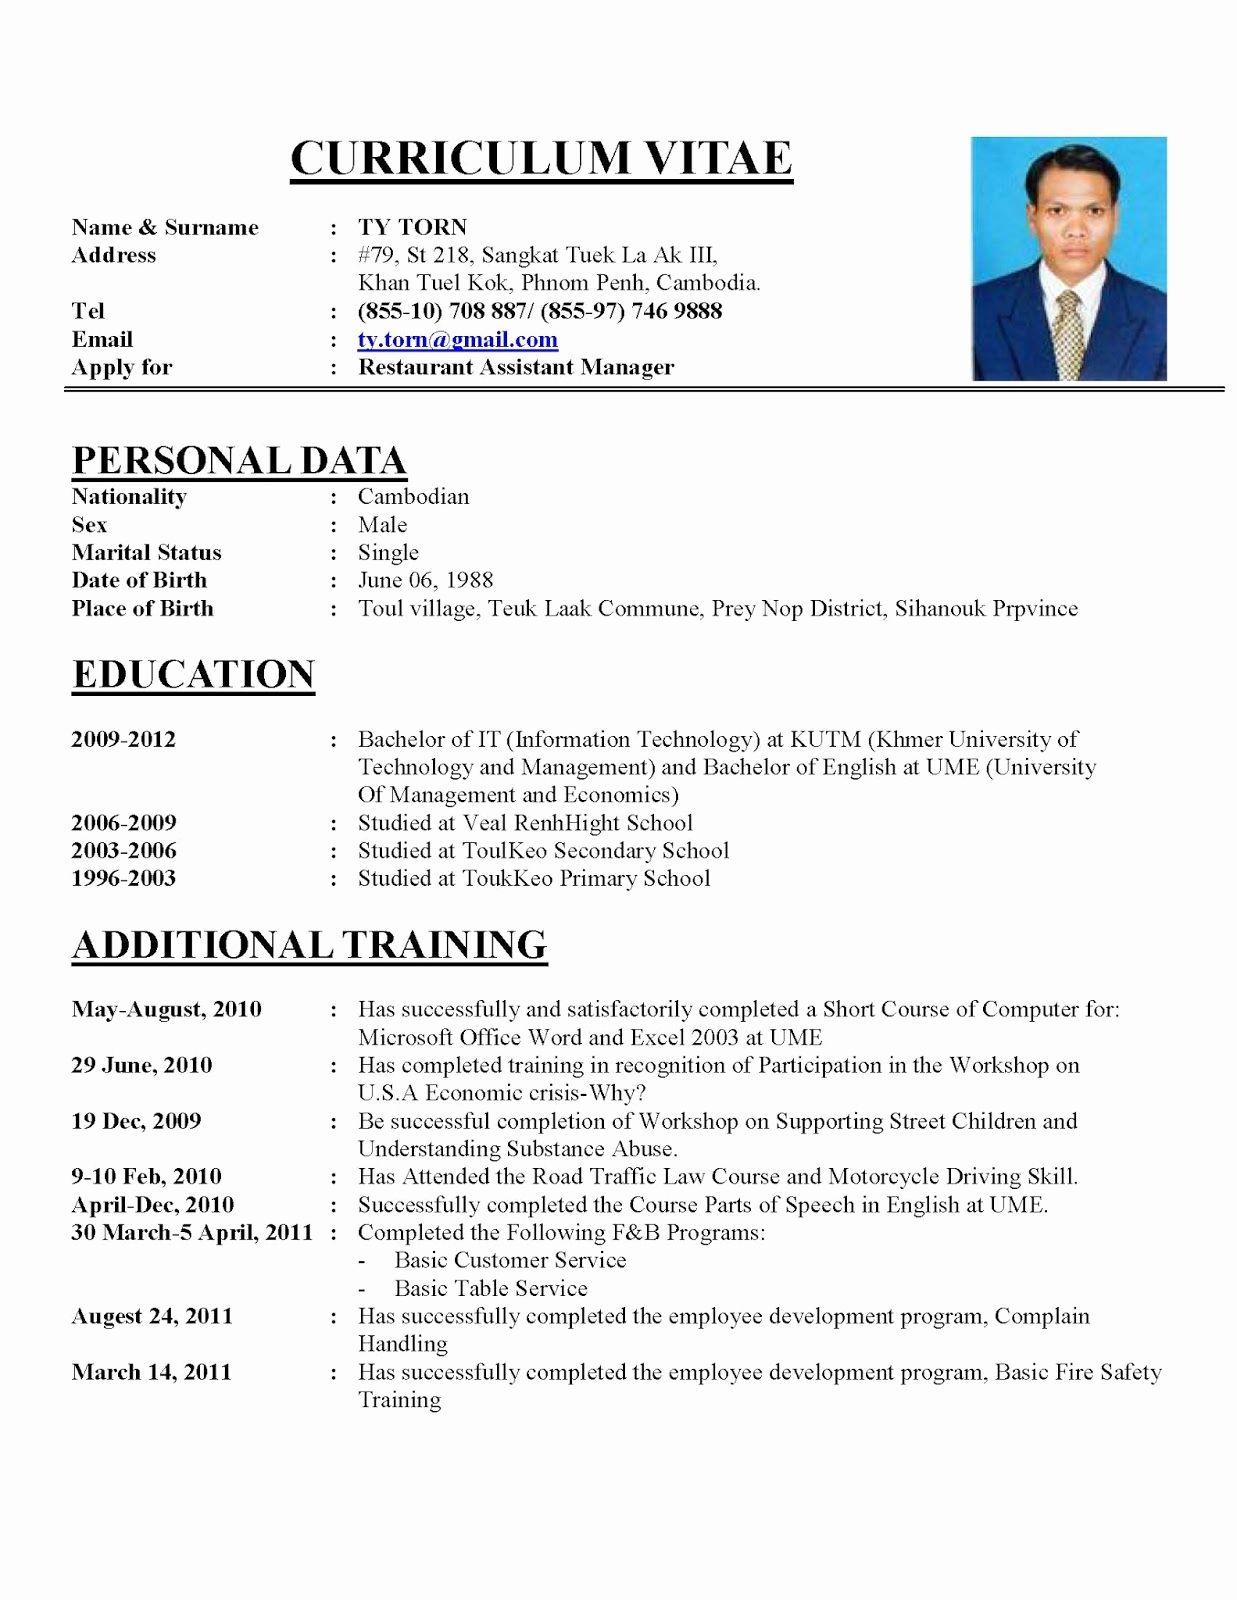 Resume Format New 2018 Format Resume Resume Format Pinterest